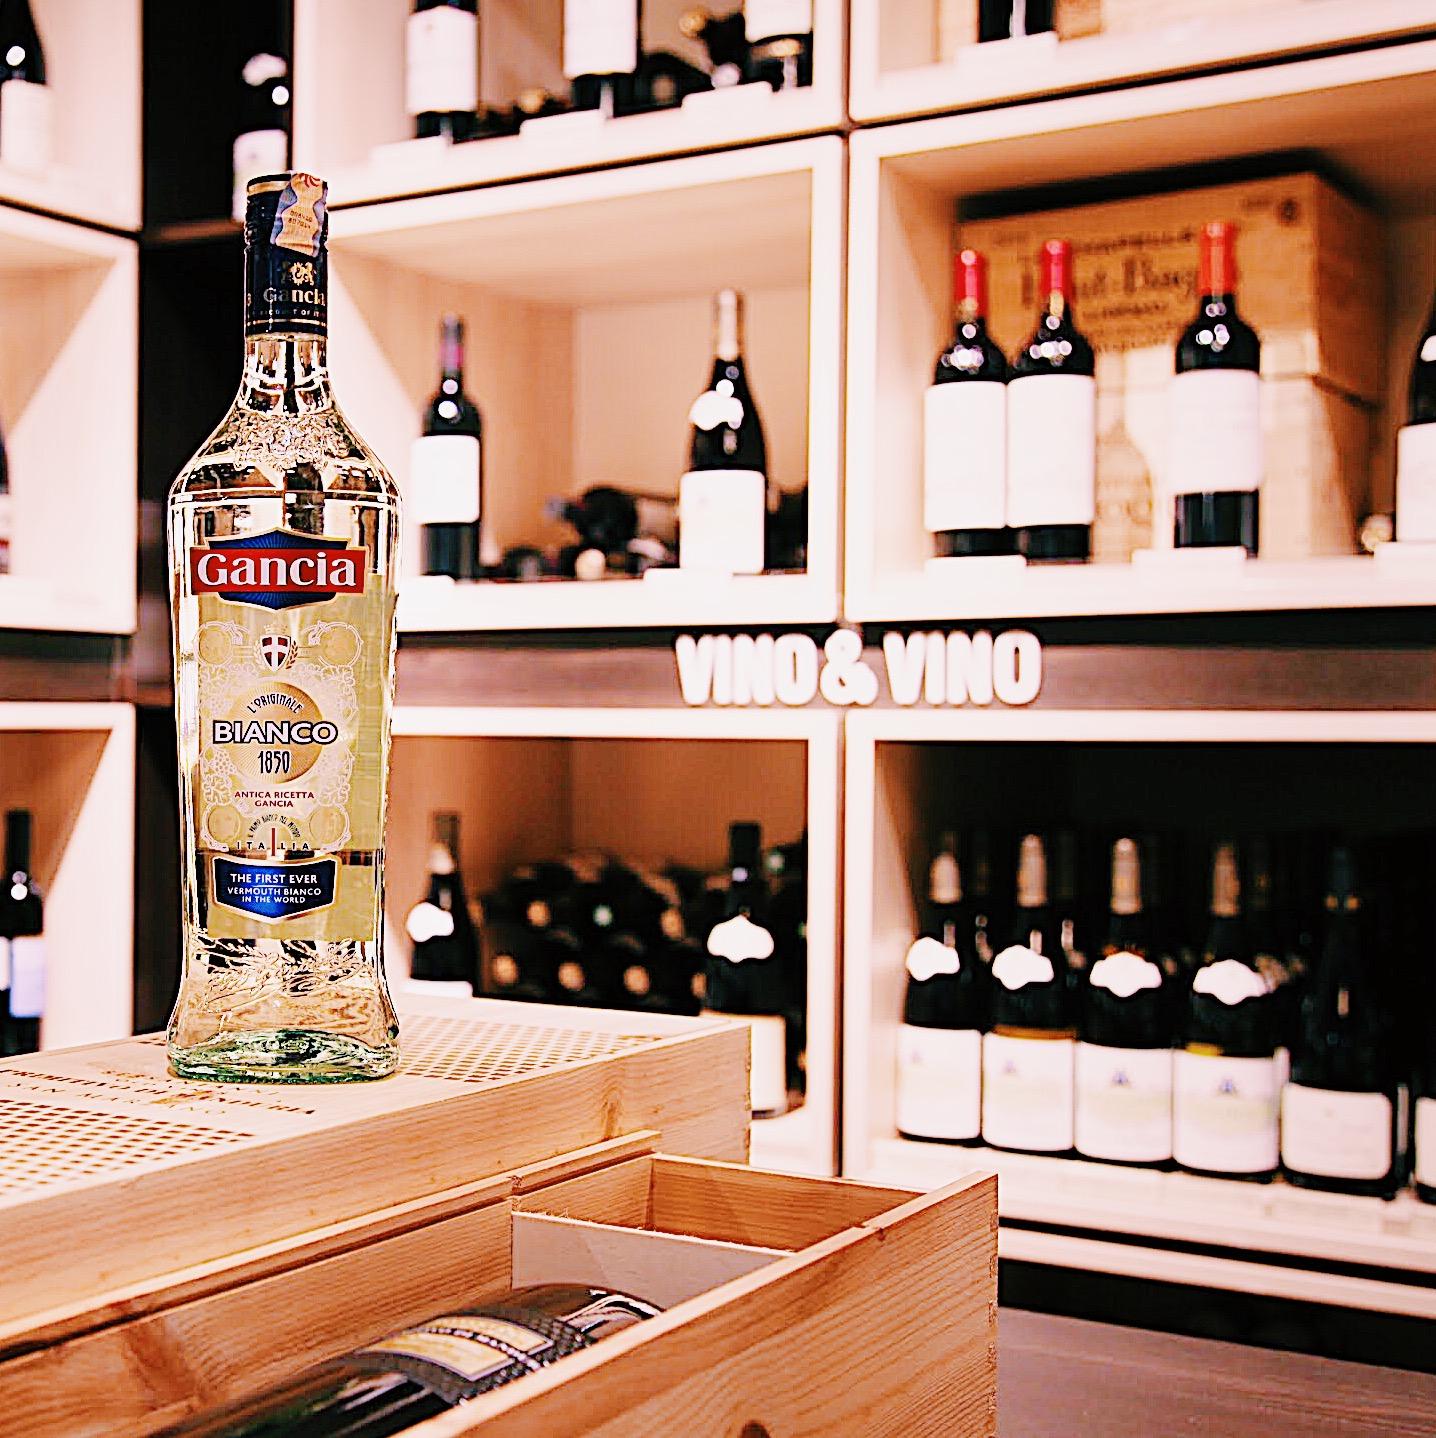 Gancia Vermouth Bianco